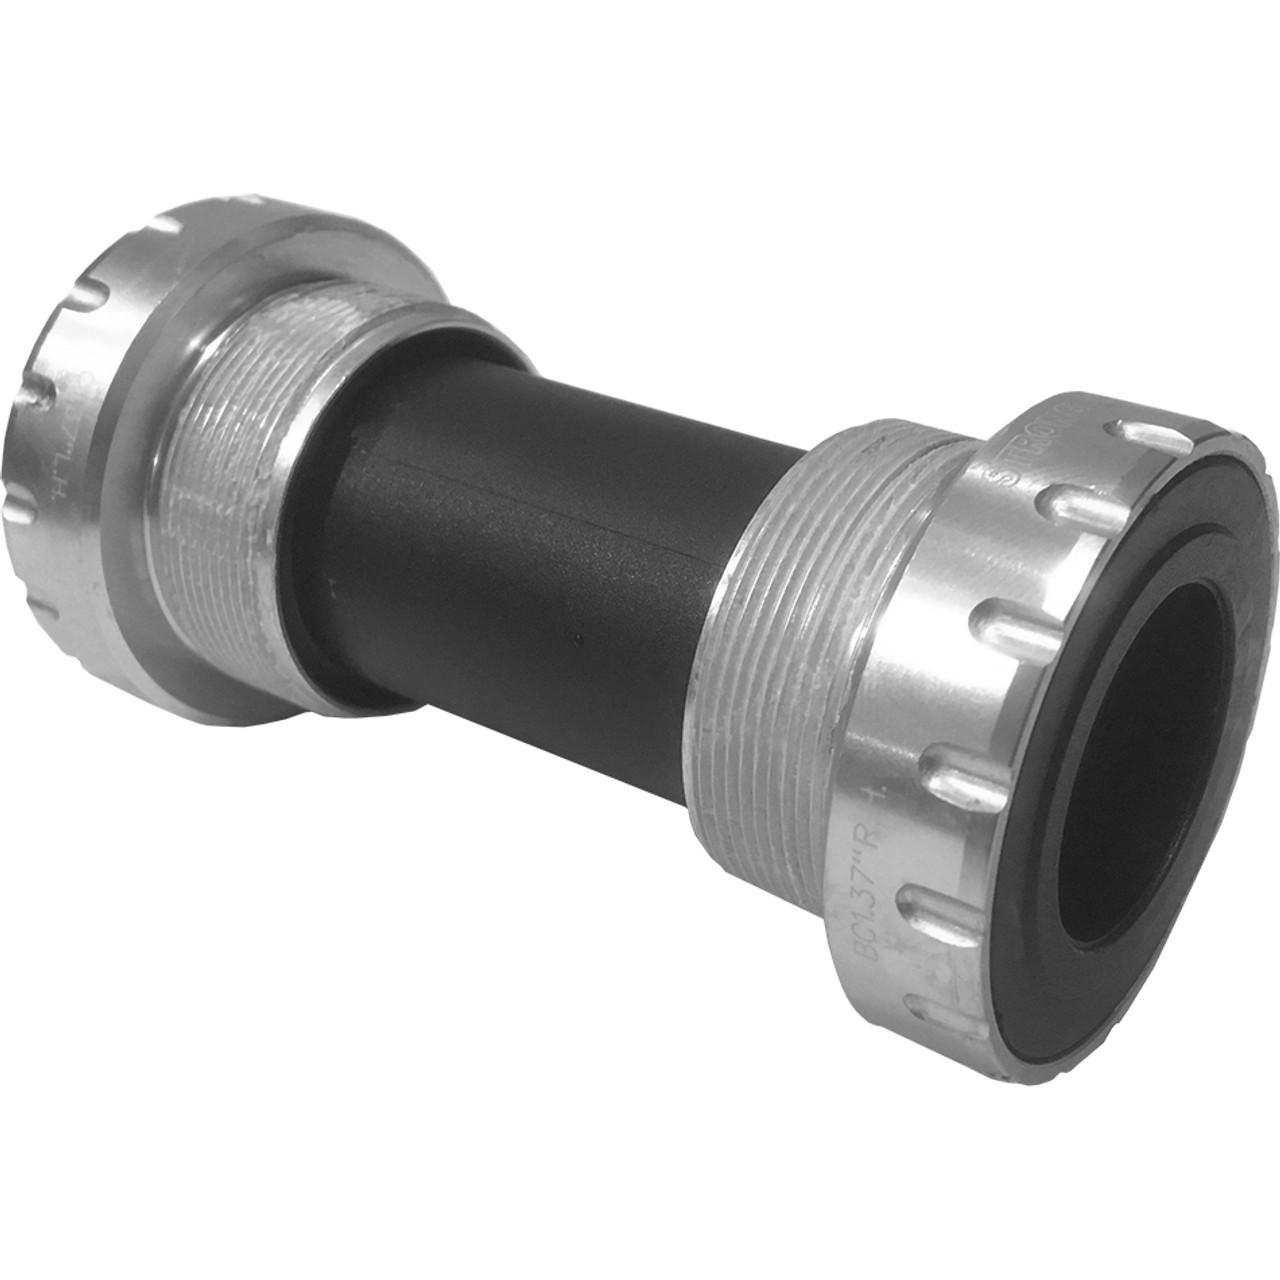 Stronglight S350122 Bottom Bracket for Shimano Hollowtech II 68mm